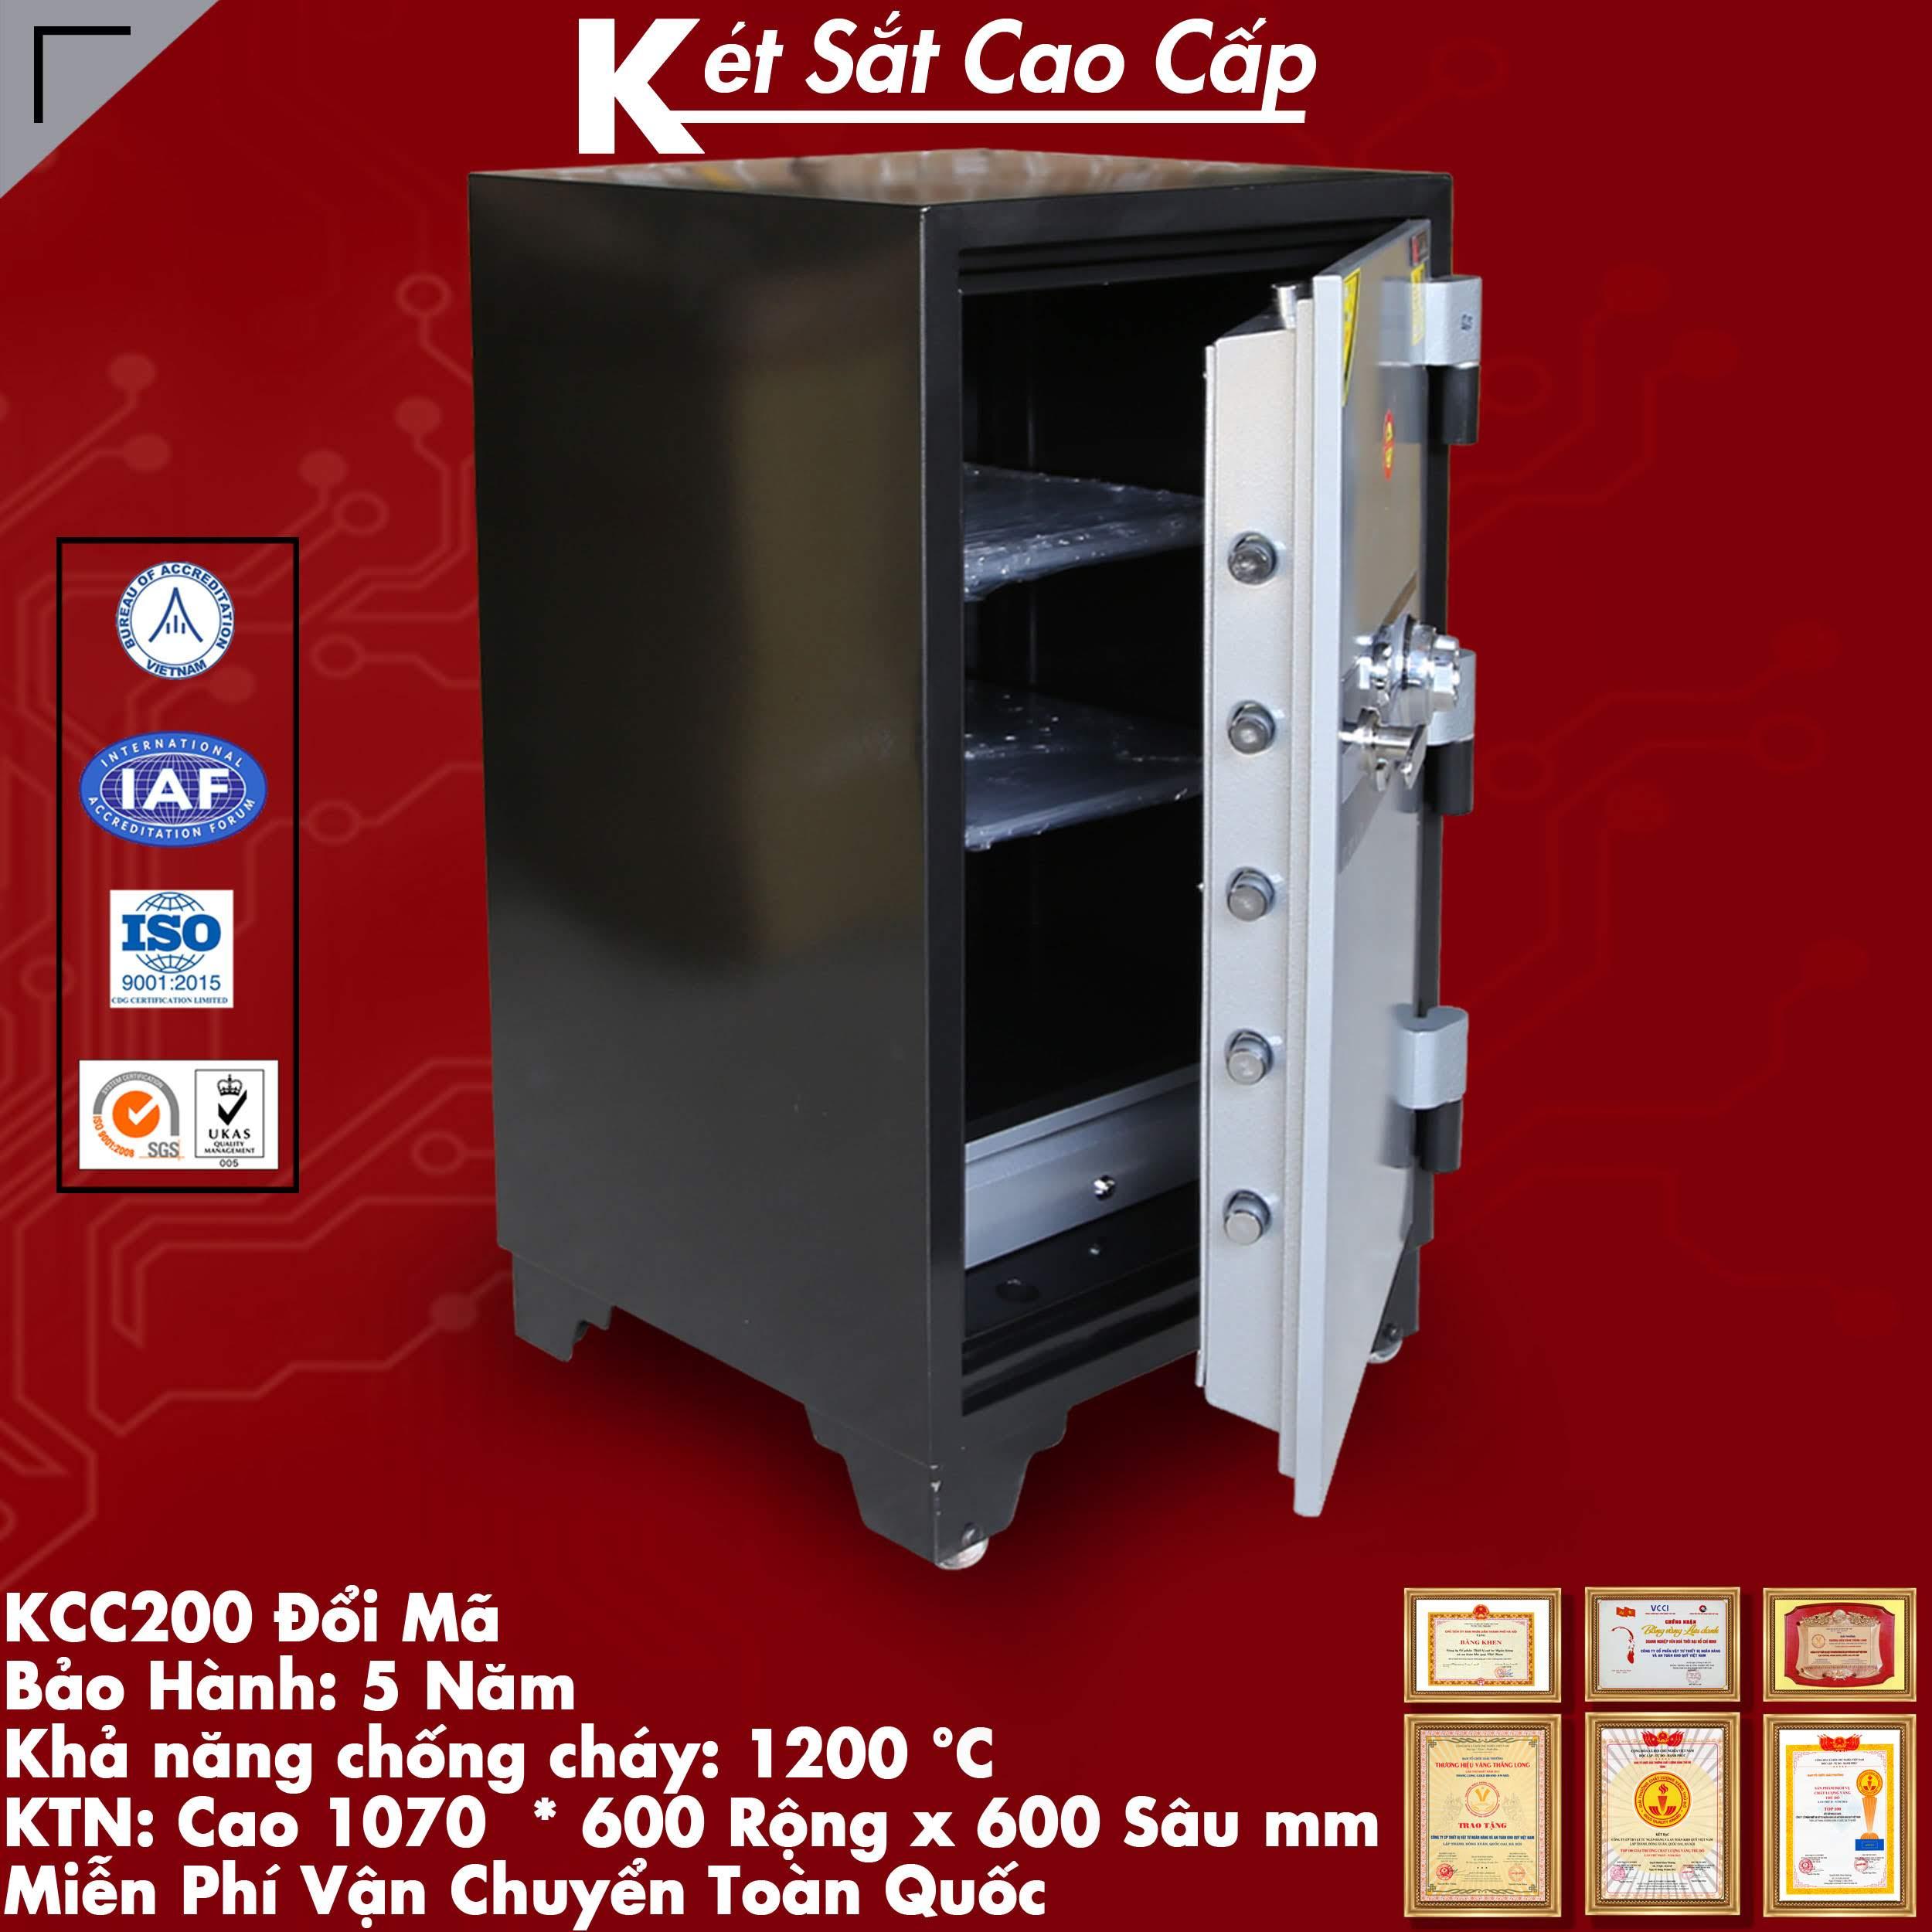 mua két sắt nhập khẩu WELKO Fire Resistant Safes tại Quảng Ngãi 1